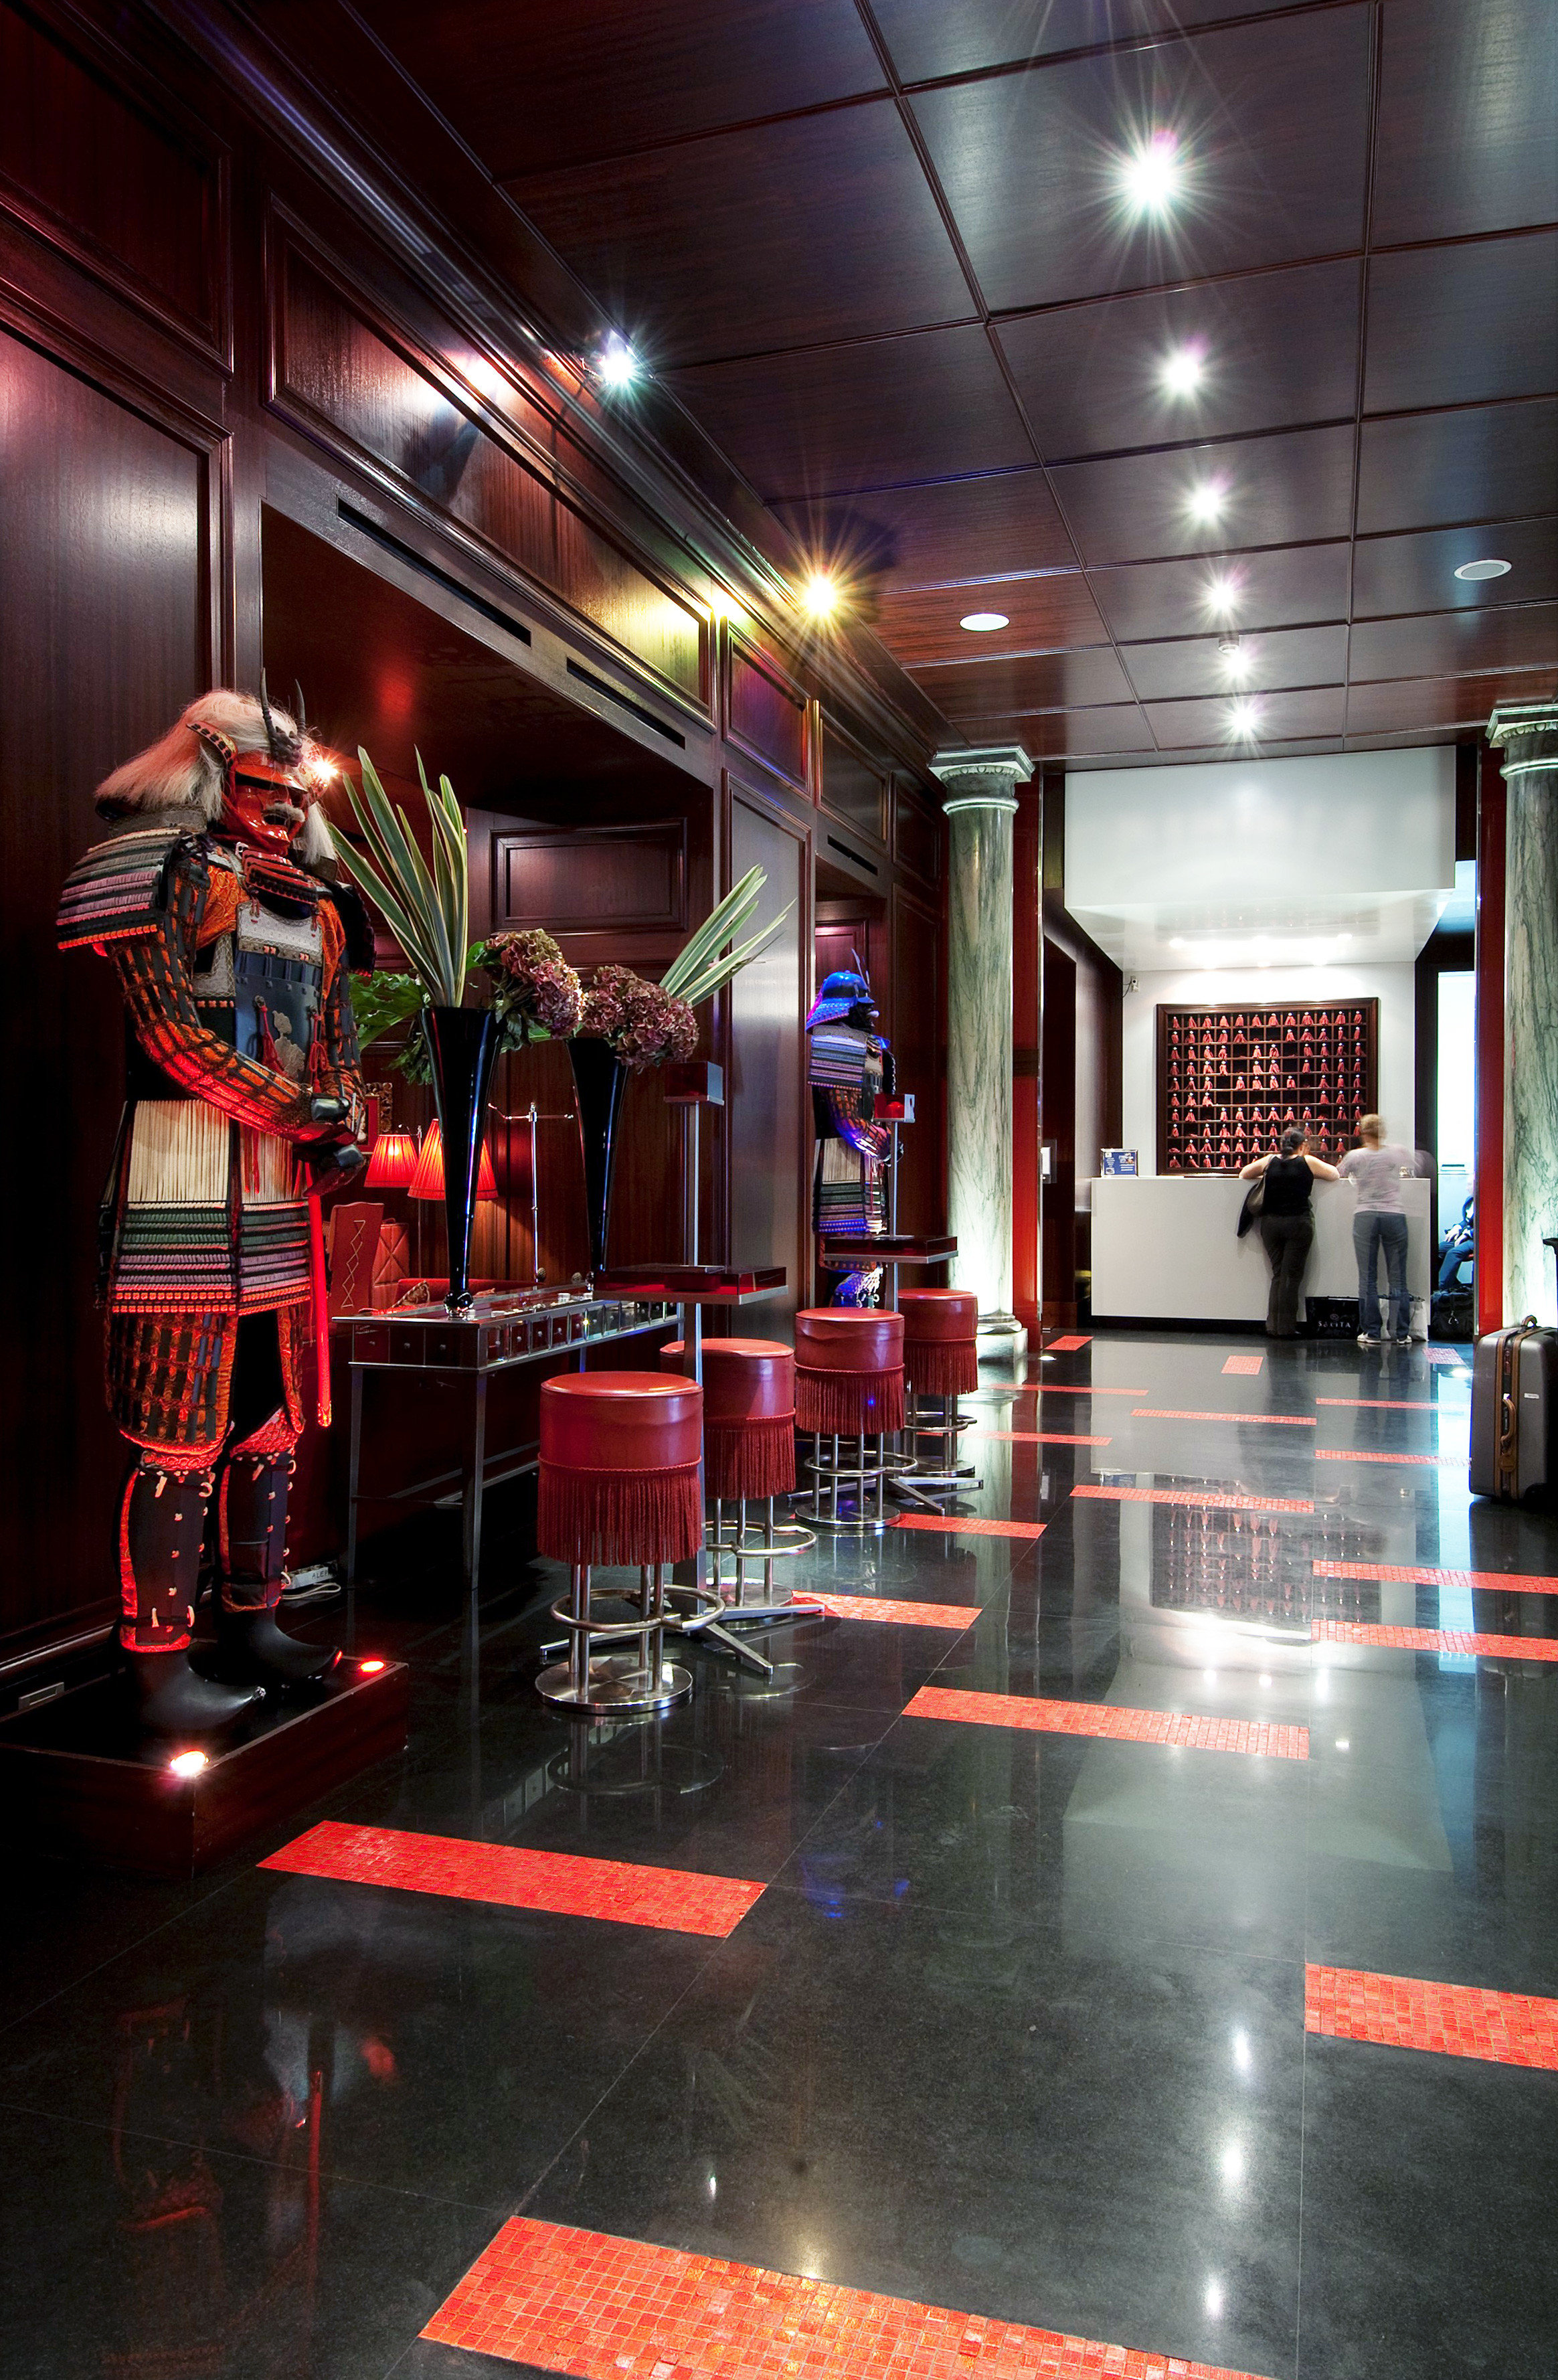 Bar Dining Drink Eat Elegant Hip Luxury Modern Nightlife stage nightclub Lobby restaurant